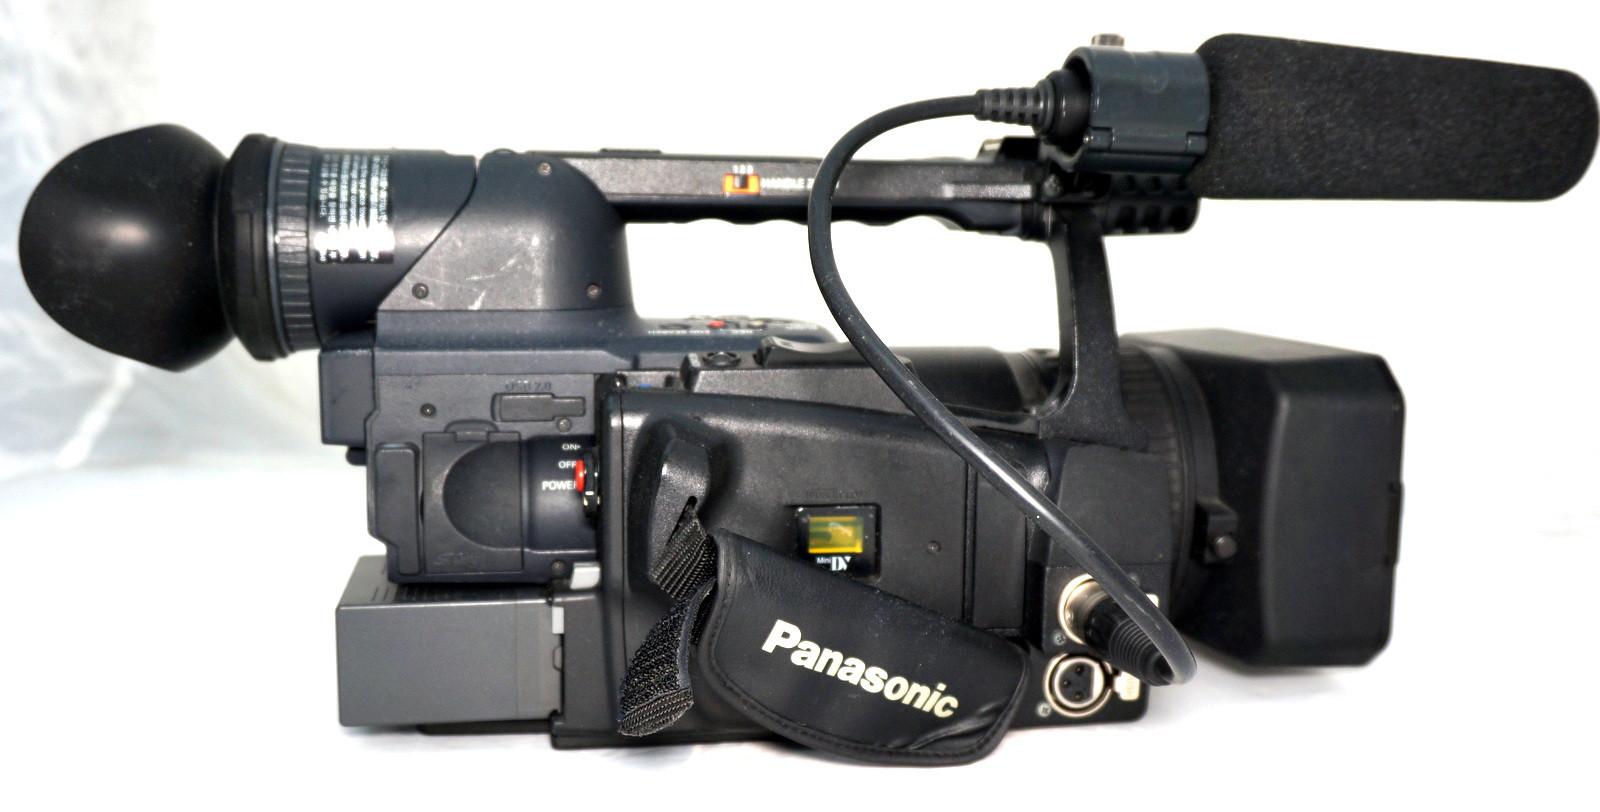 Panasonic AG-HVX201